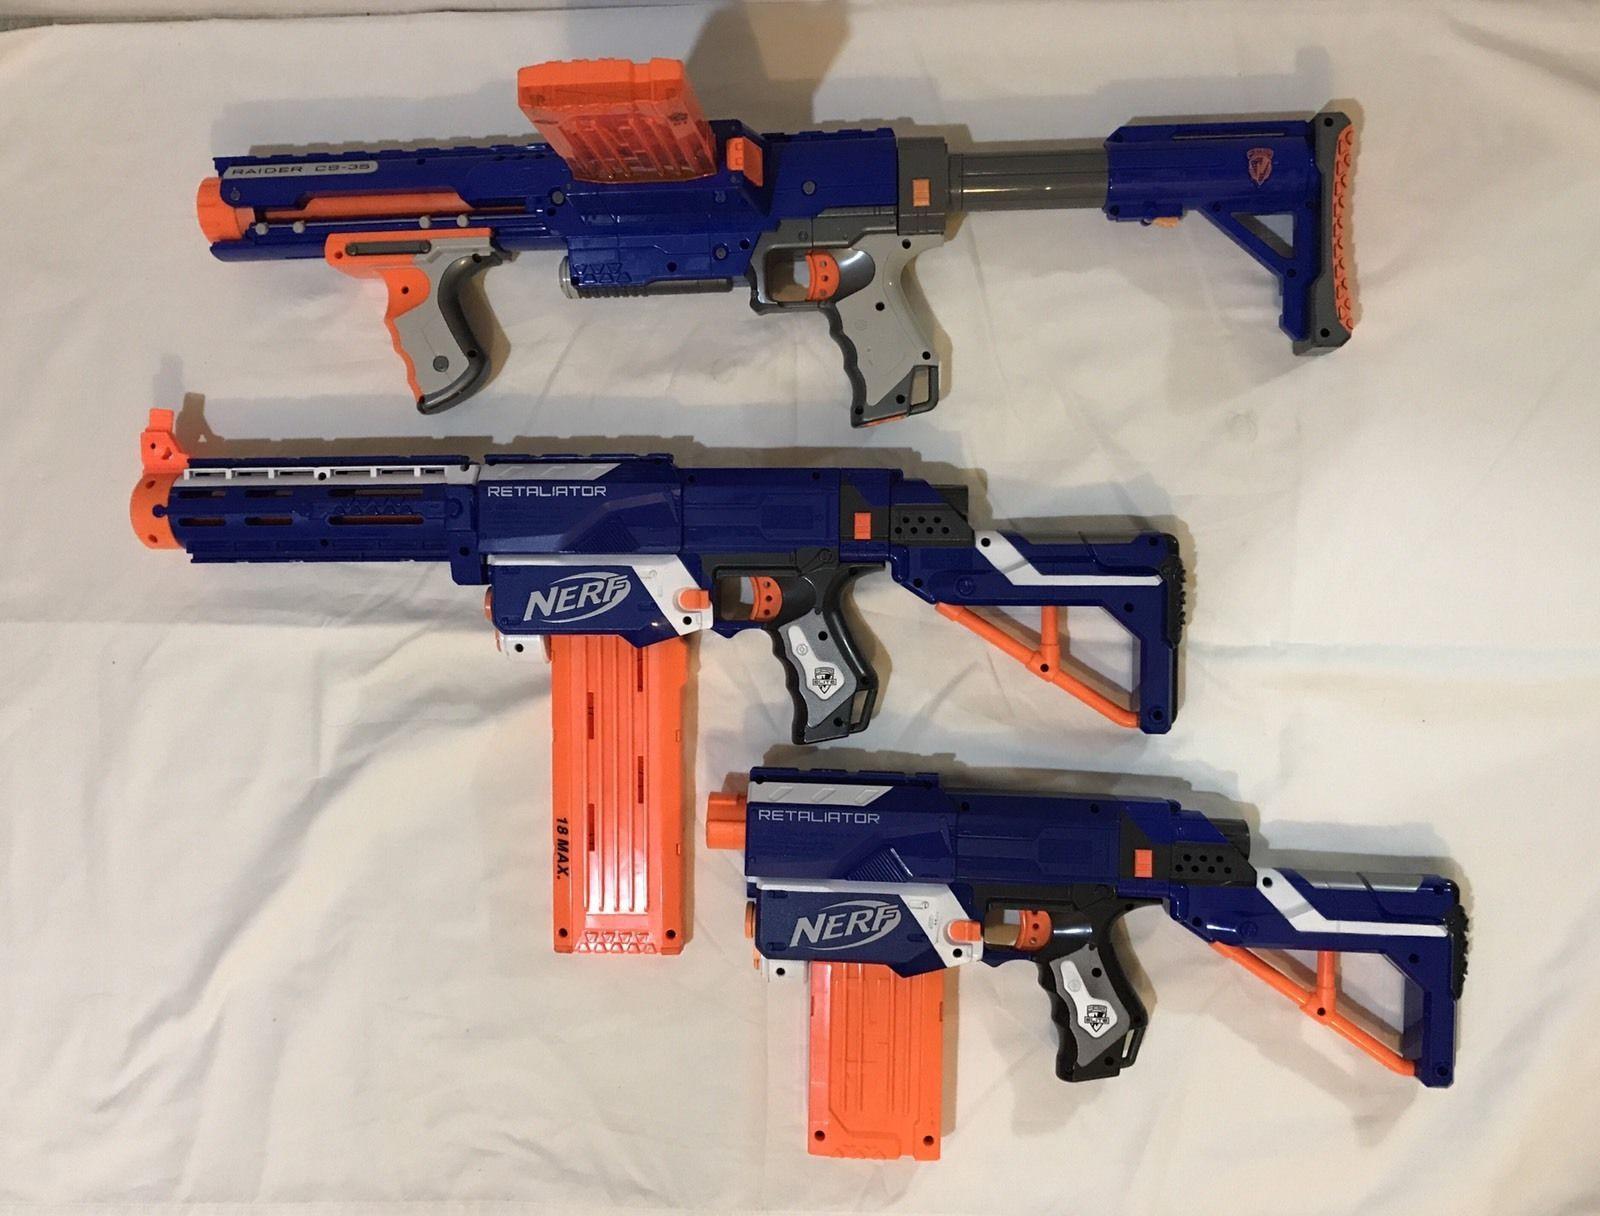 NERF N-STRIKE ELITE HAIL-FIRE BLASTER TOY GUNS, Blasters & Foam Play -  Amazon Canada